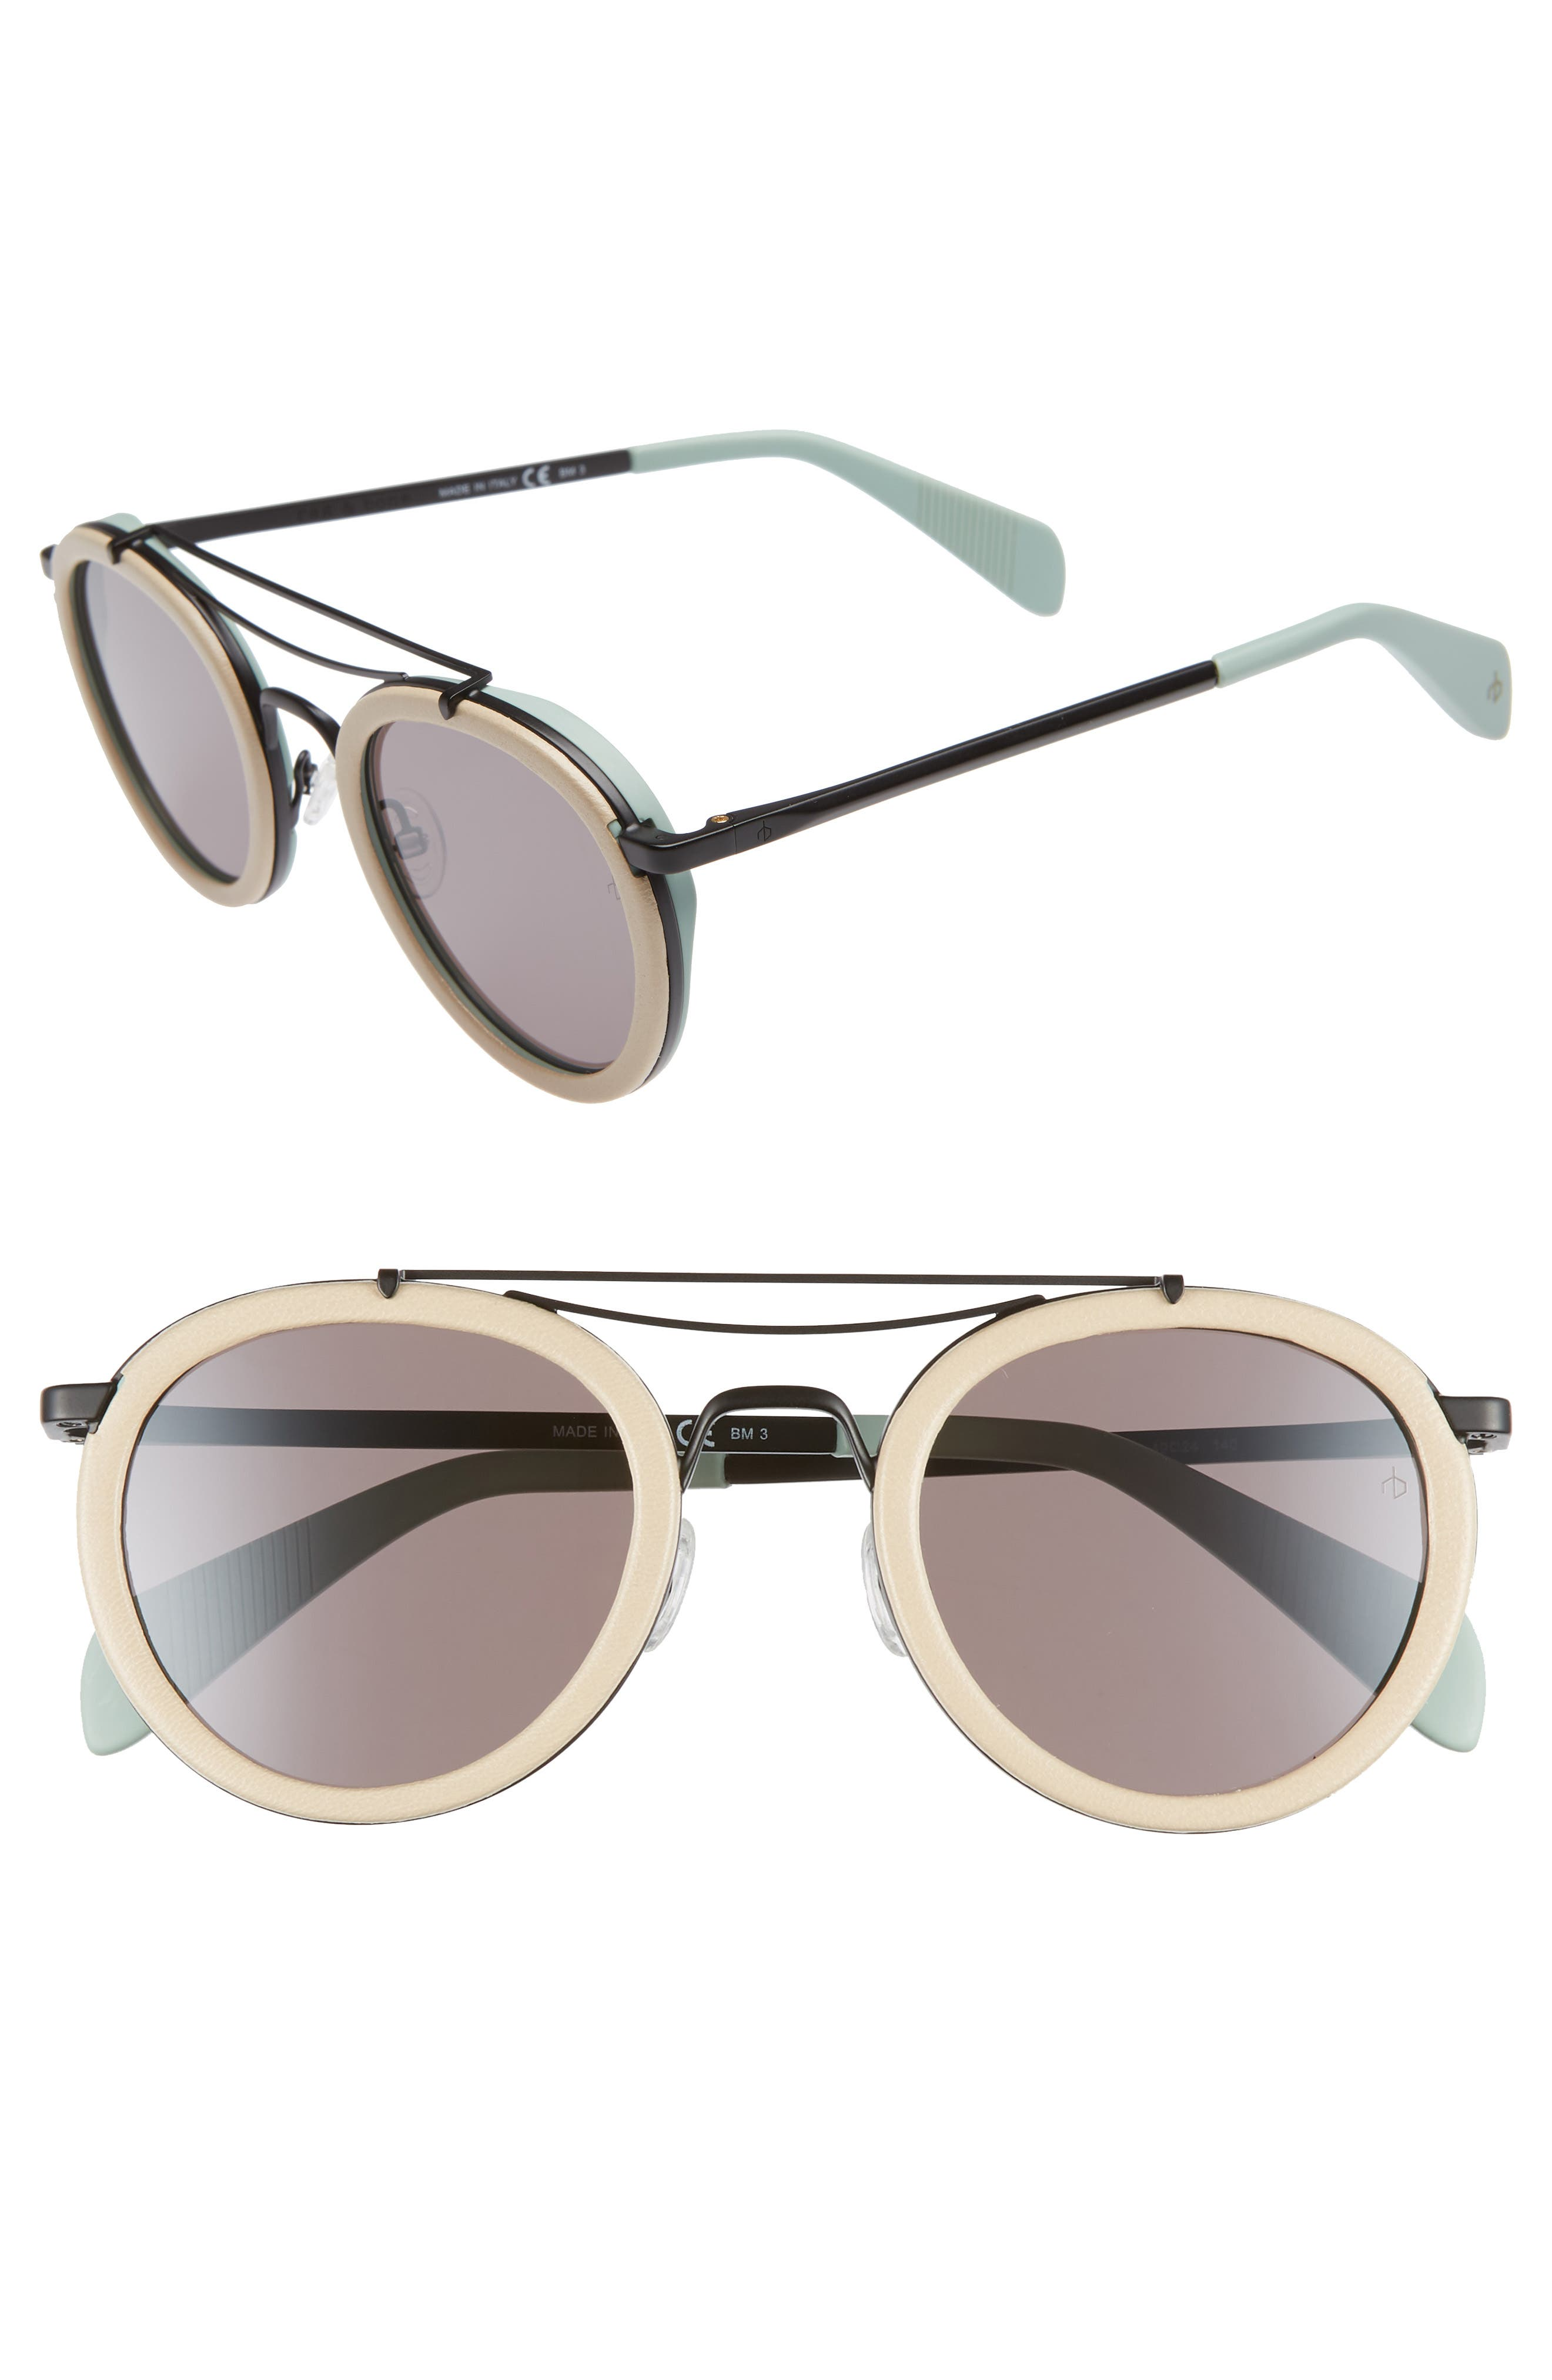 55mm Round Aviator Sunglasses,                             Main thumbnail 1, color,                             MATTE BLACK BEIGE